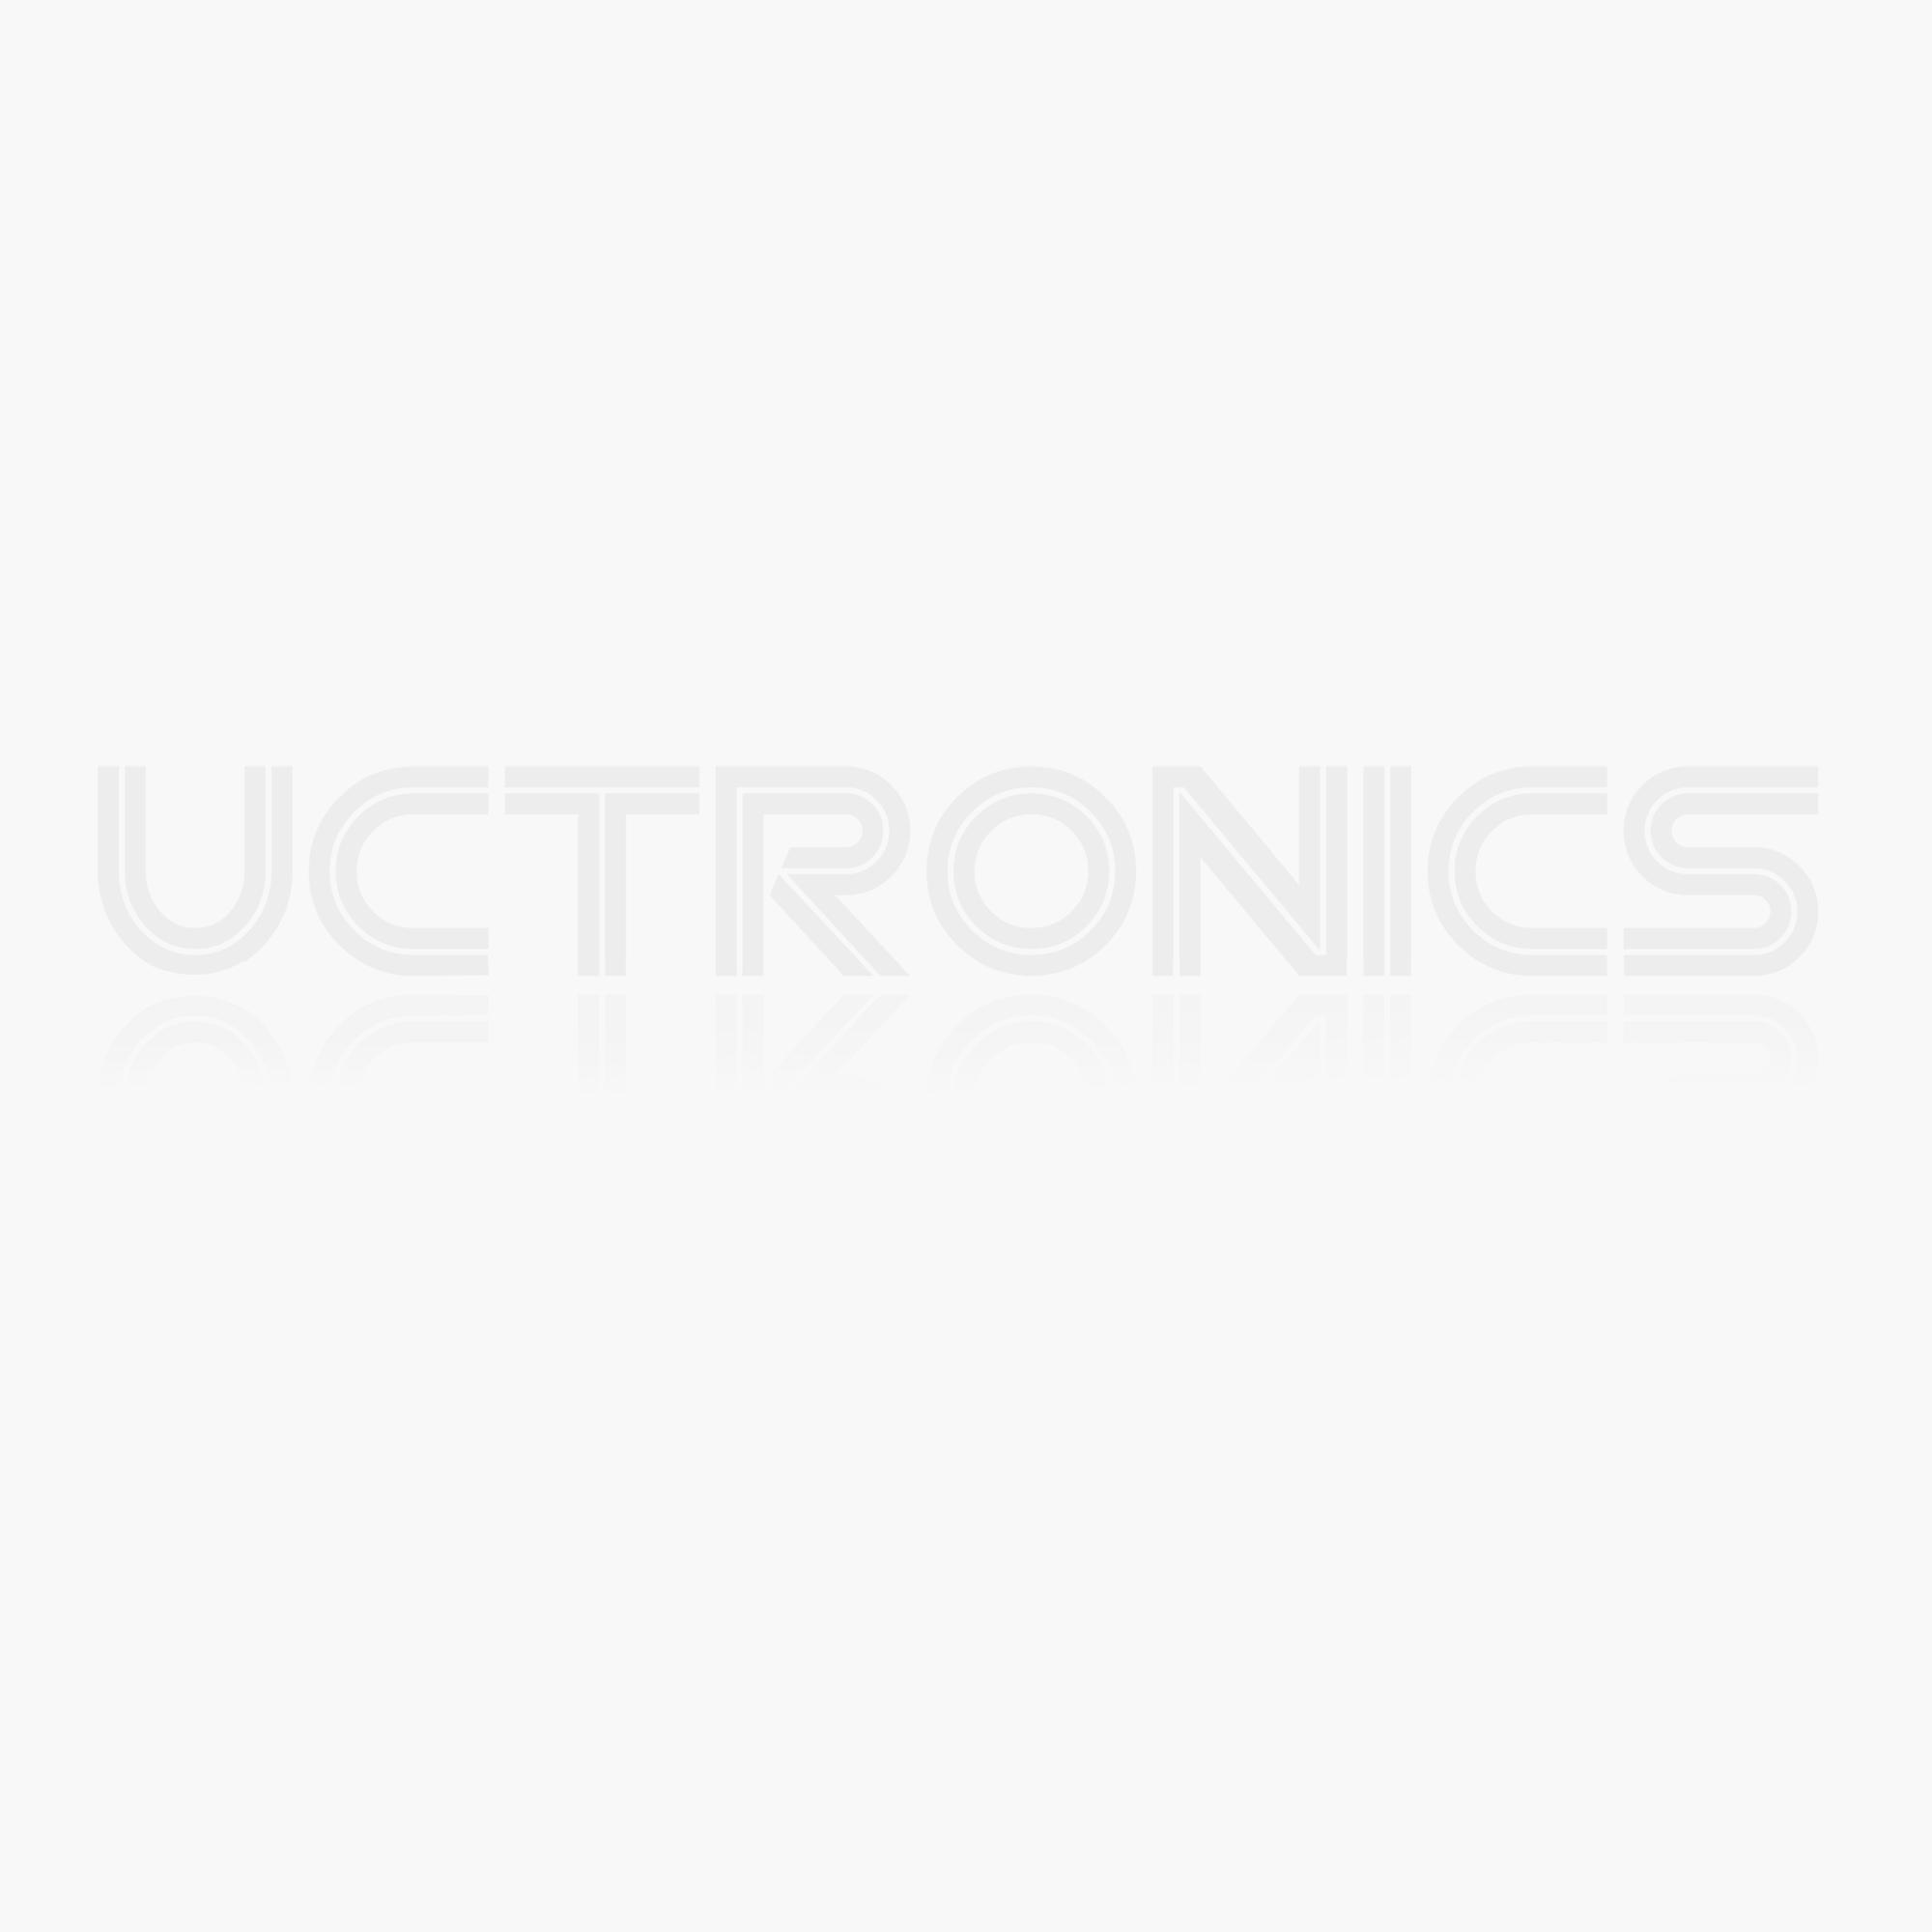 V27A Digital AC 75-300V Voltage Meter Self-Powered Green